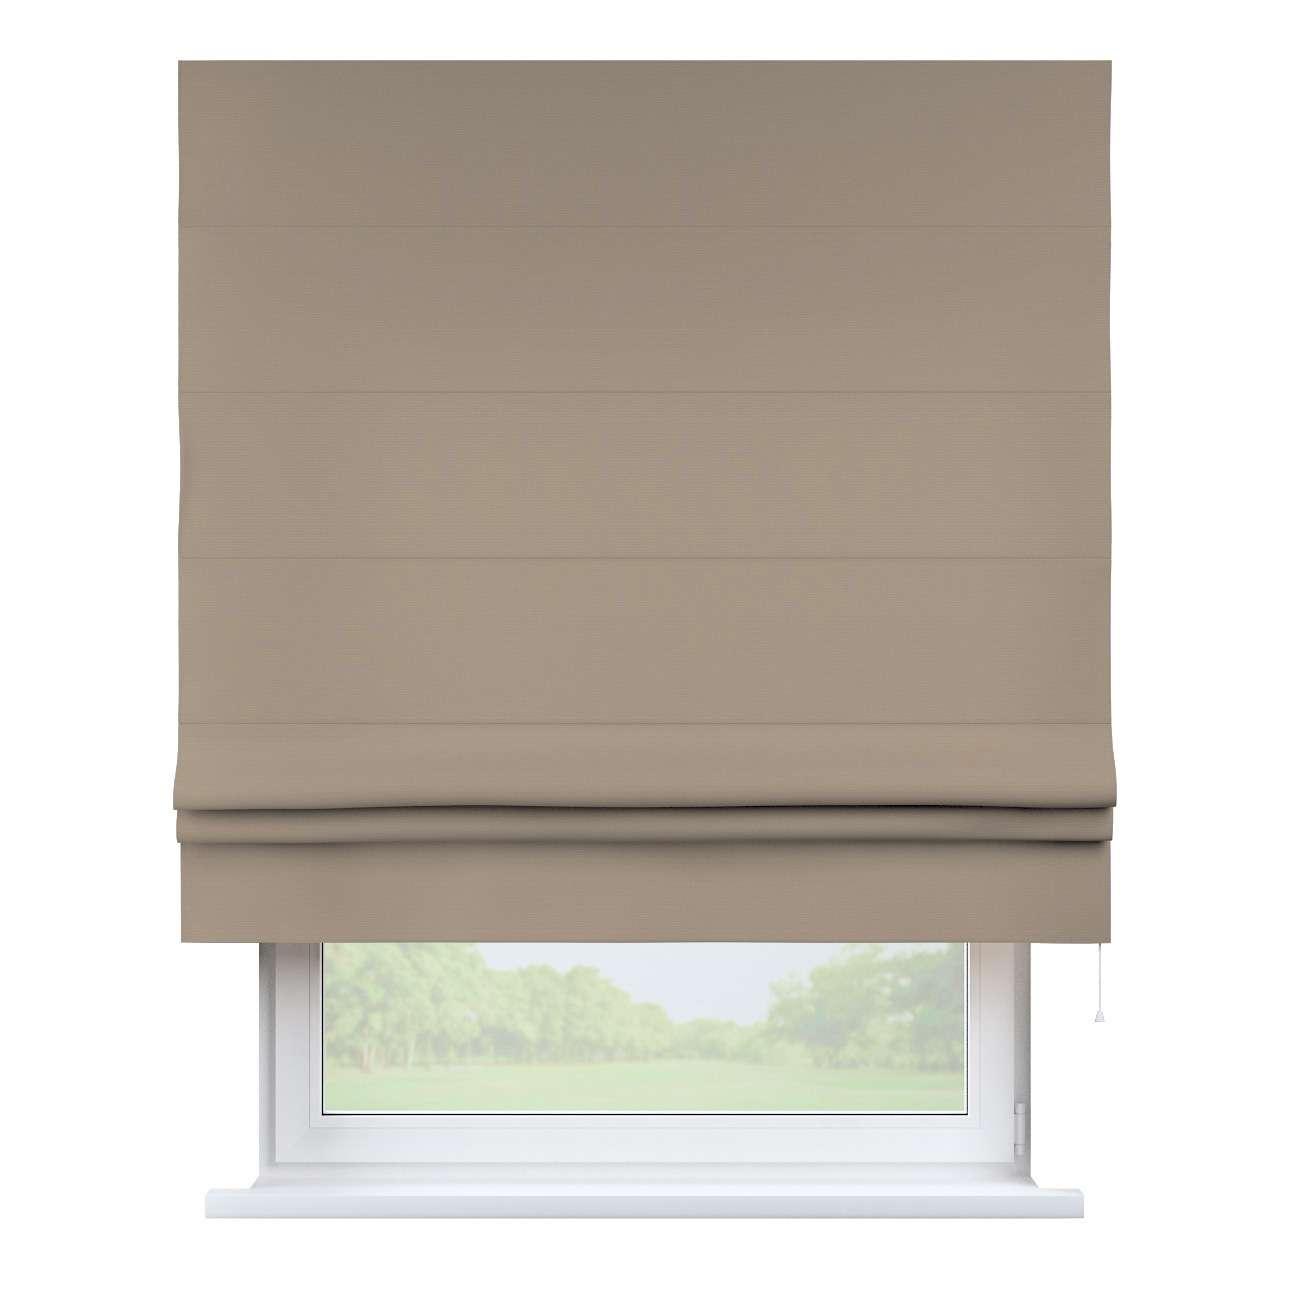 Raffrollo Padva, grau-braun , 130 × 170 cm, Cotton Panama